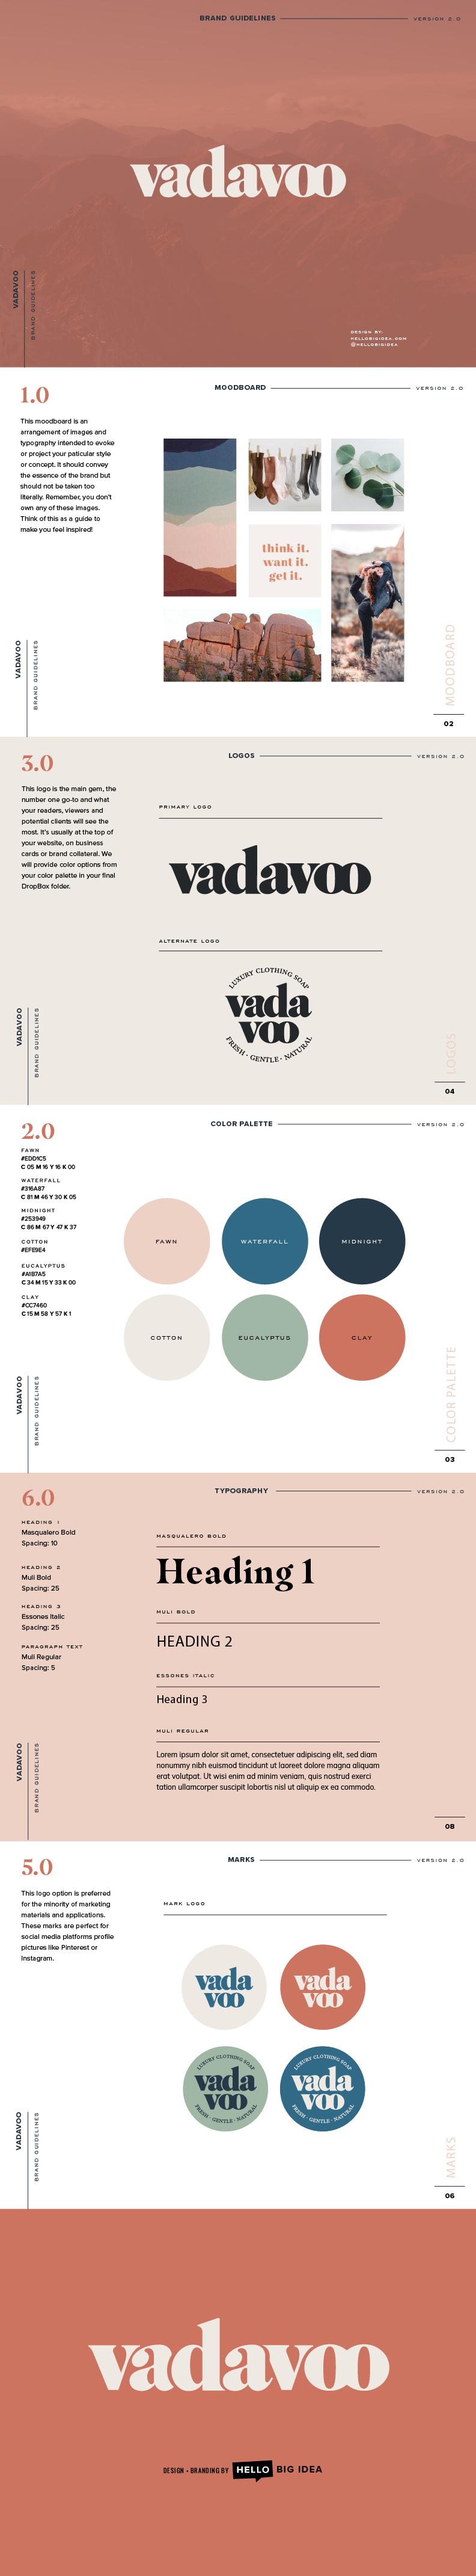 kansas city design agency - hello big idea.png